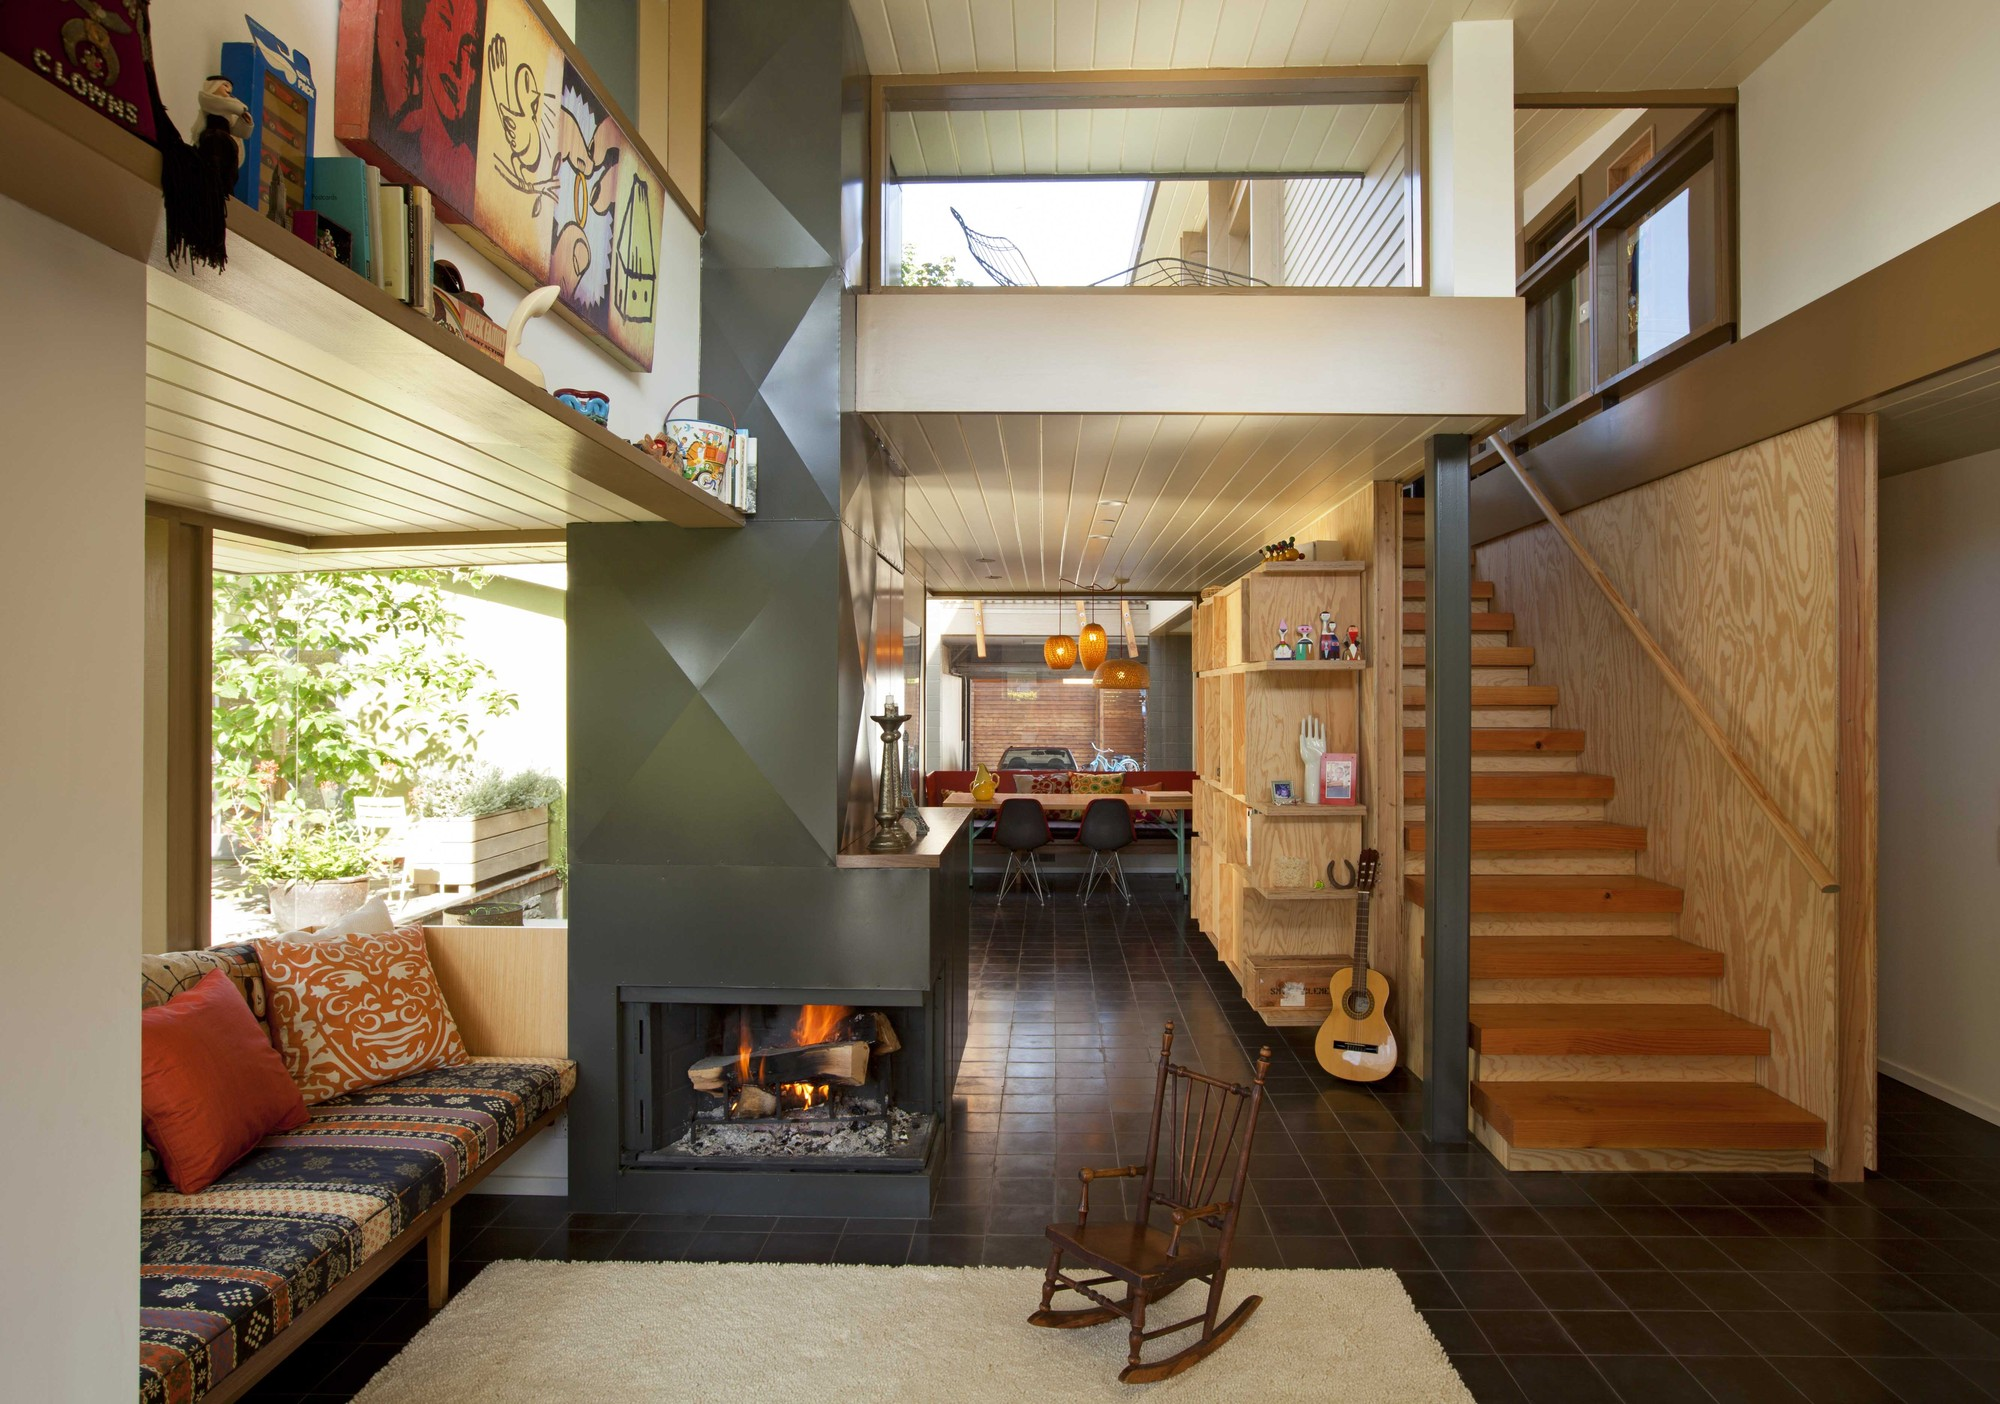 cozy home designs cozy house design cozy home decor julianne